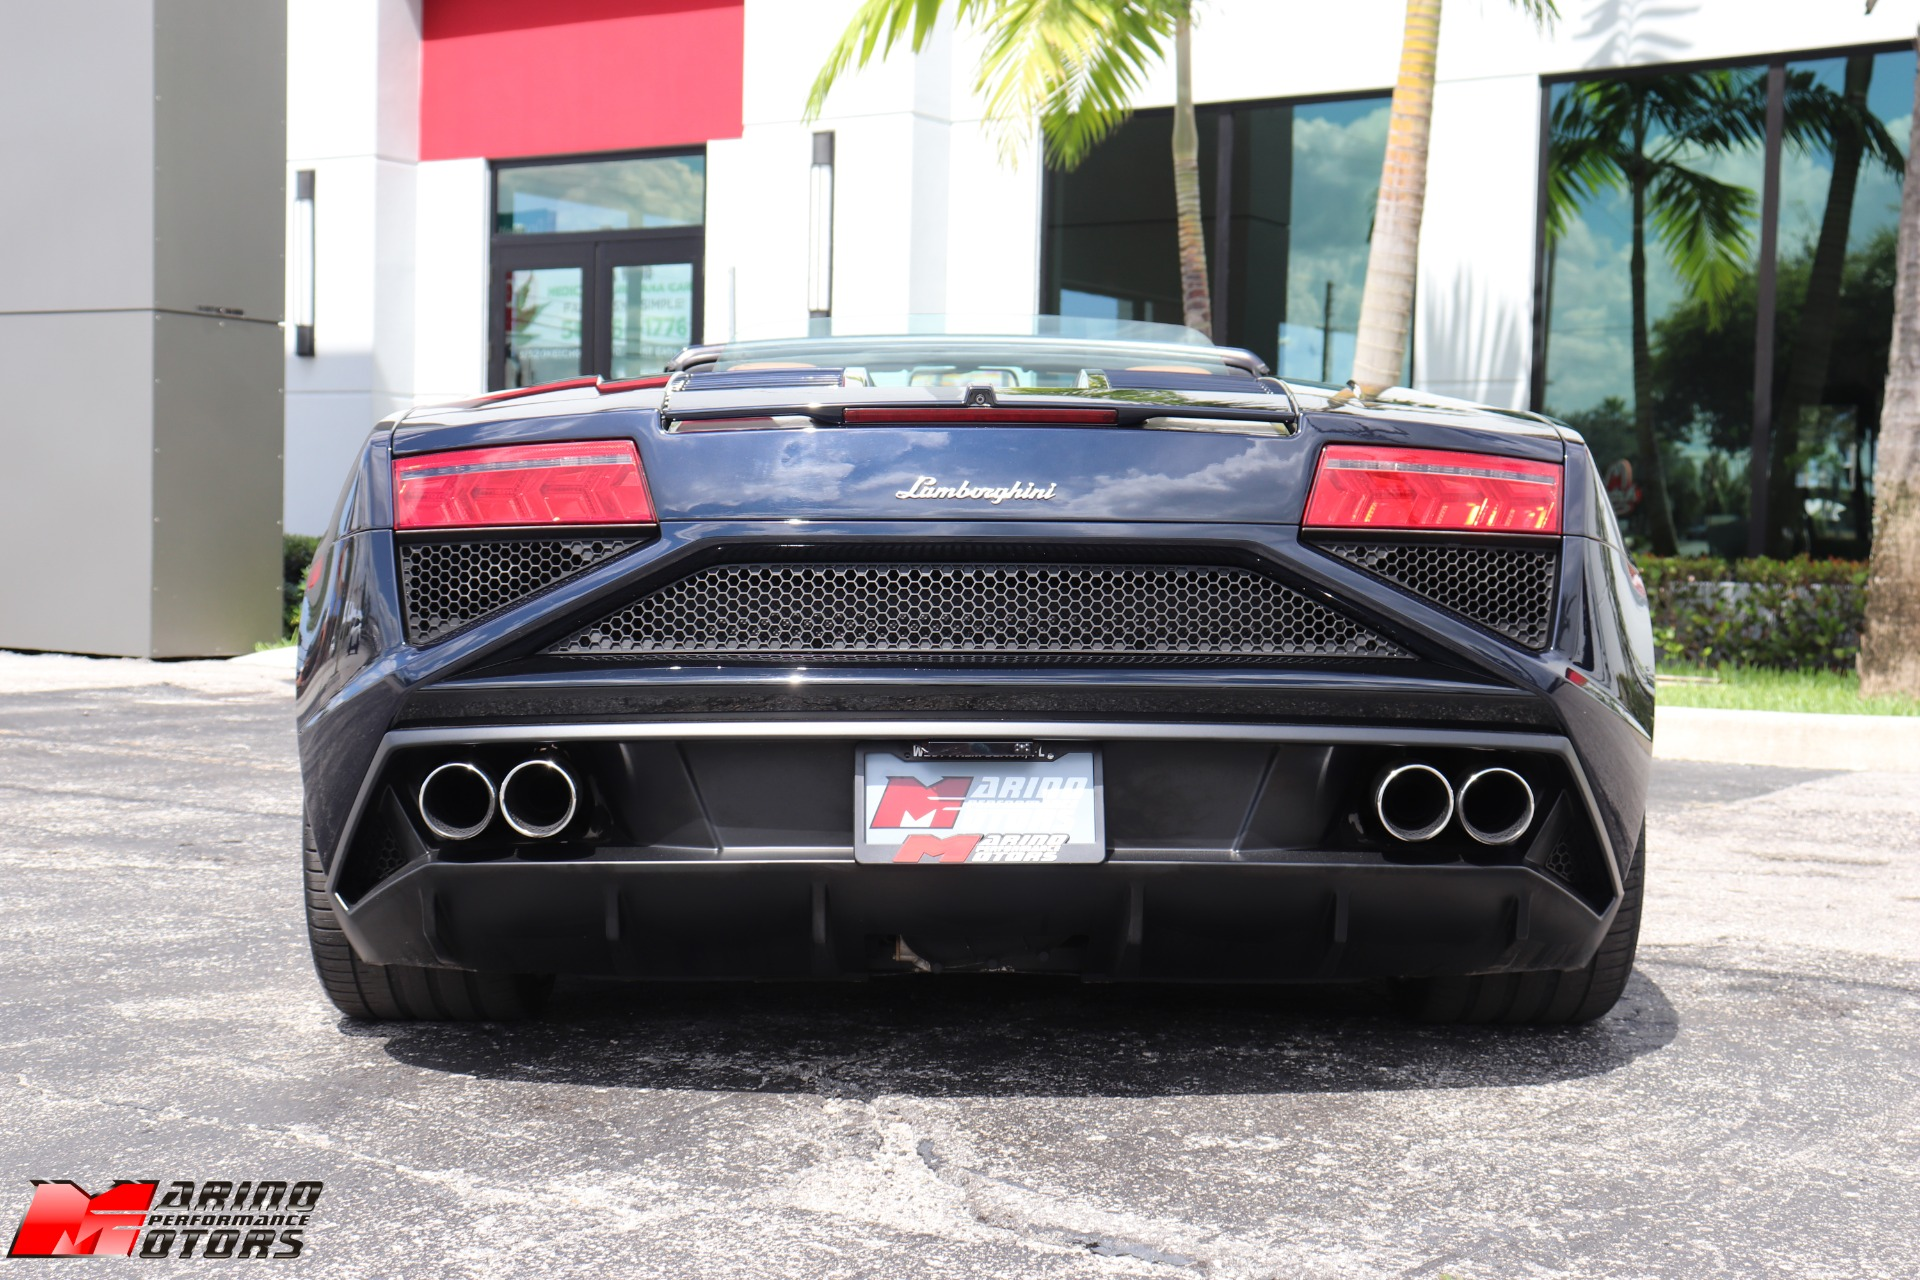 Used-2013-Lamborghini-Gallardo-LP-560-4-Spyder